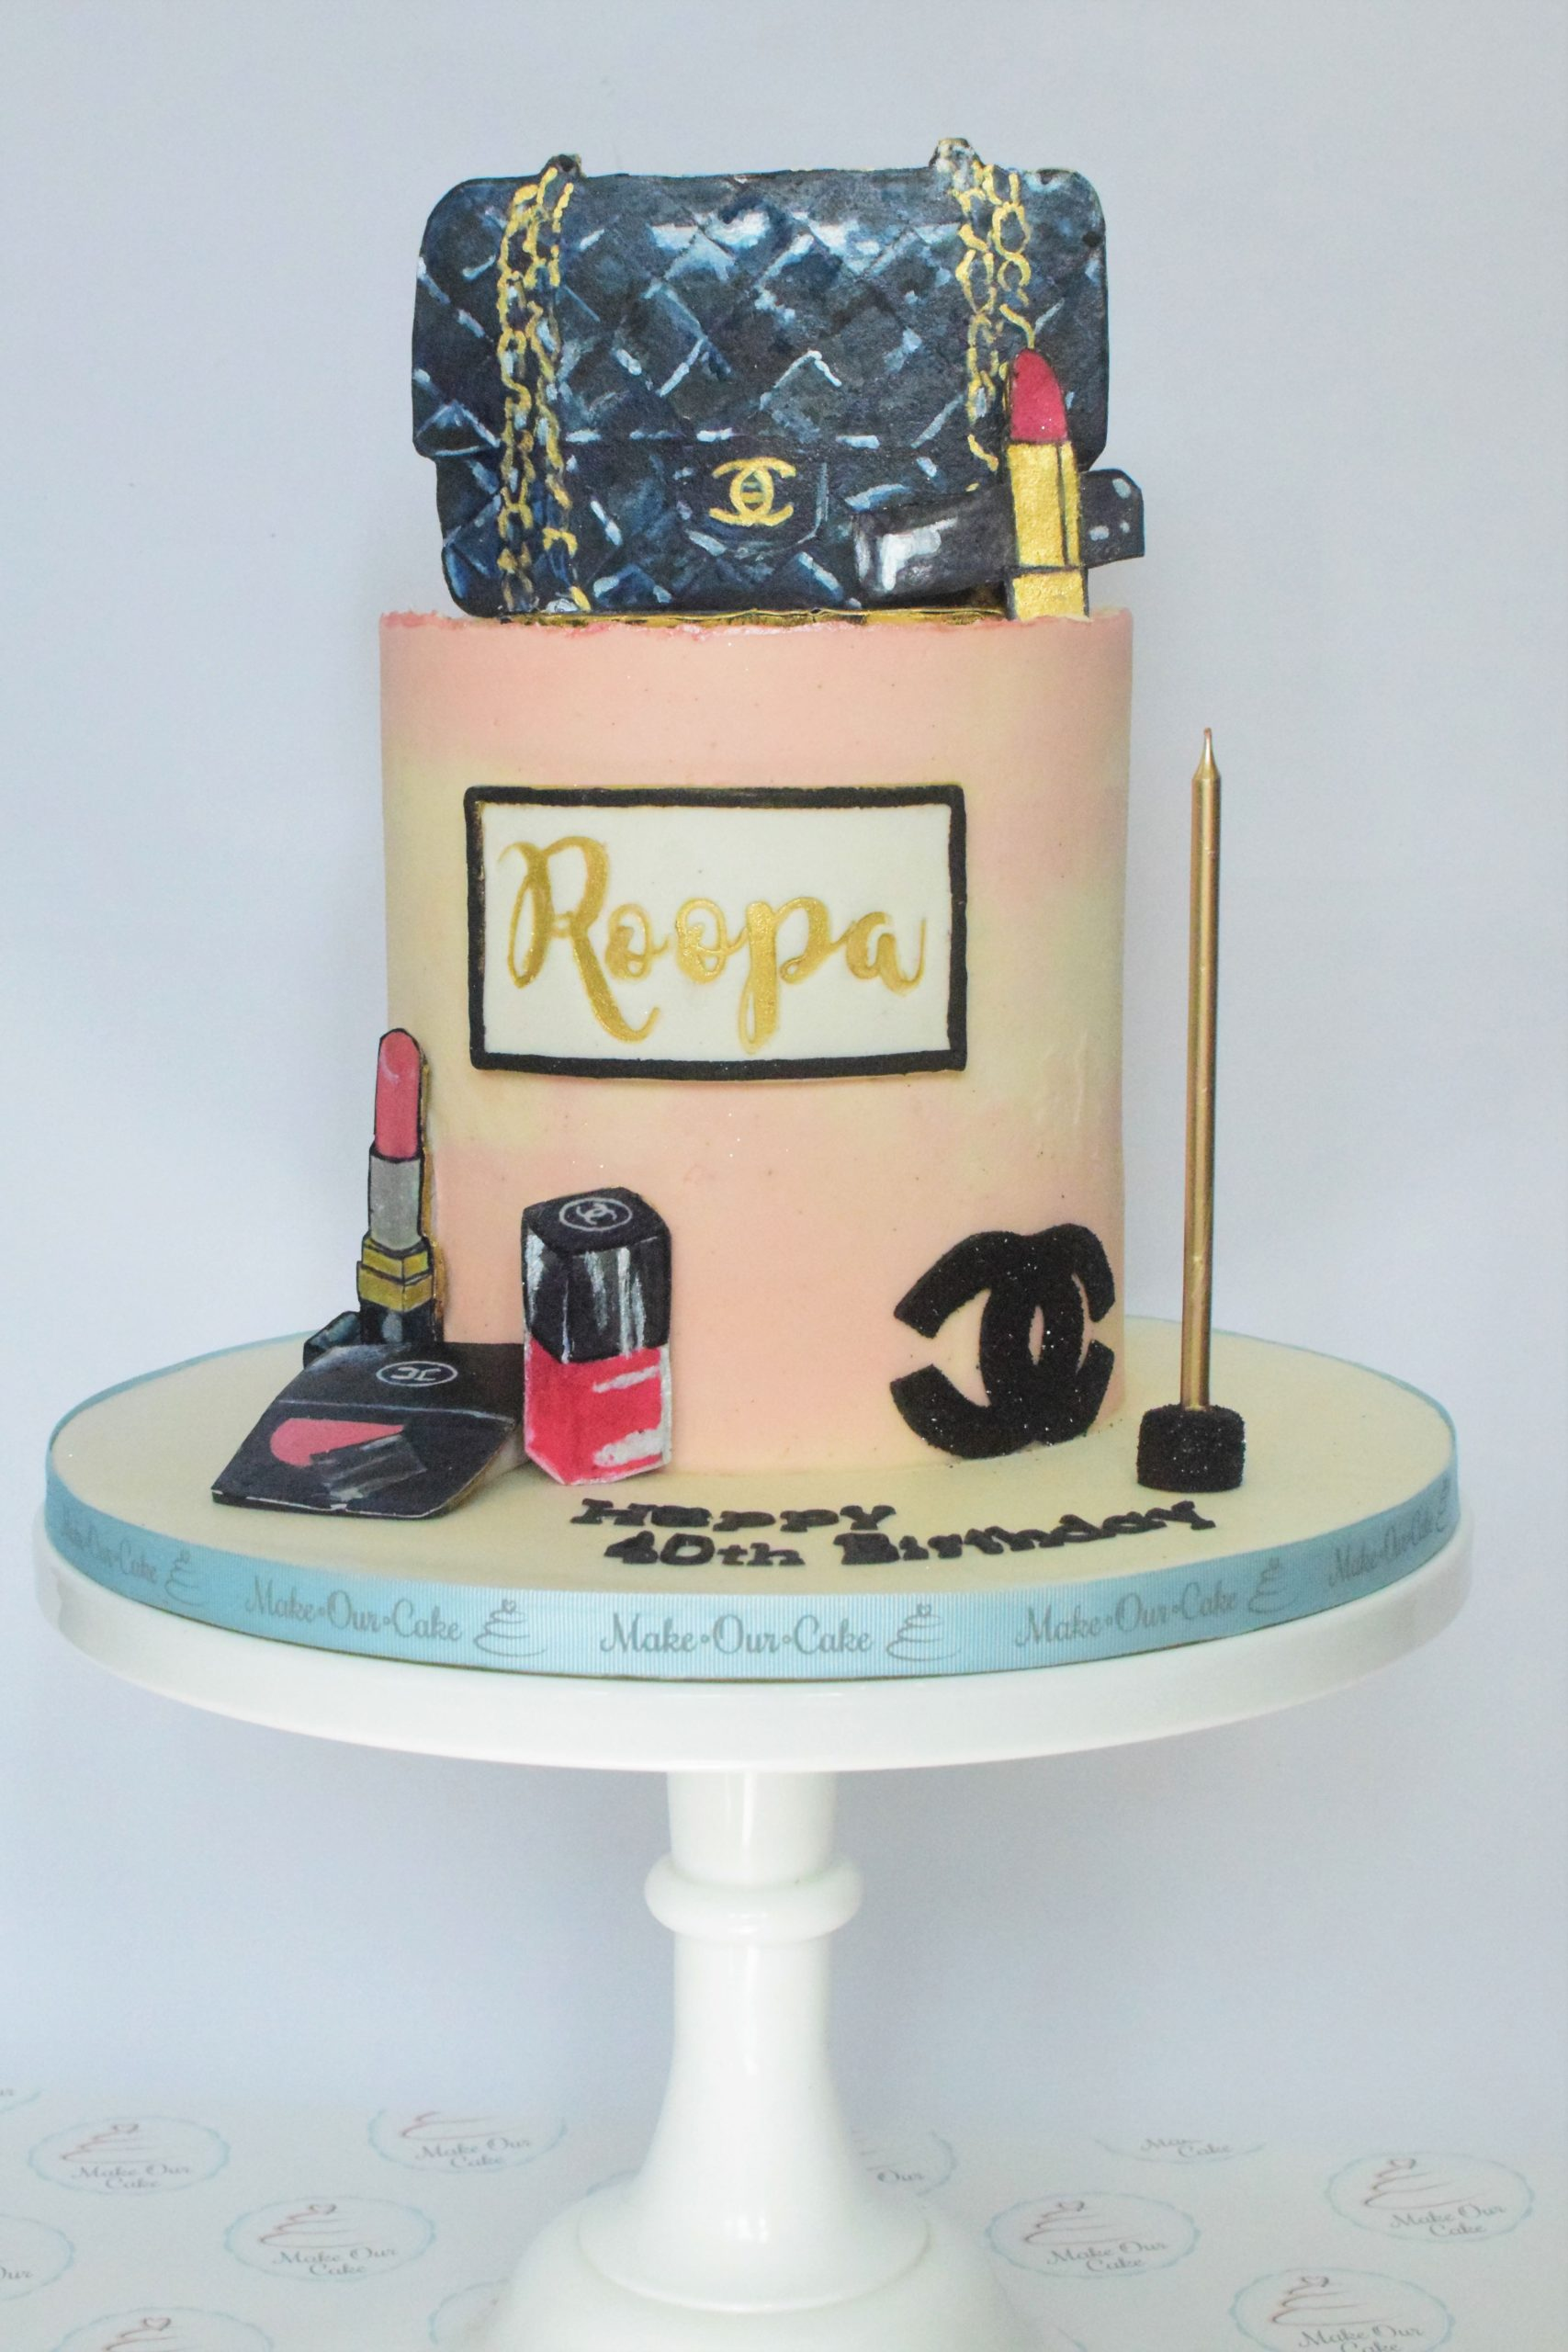 makeup cake - style 1